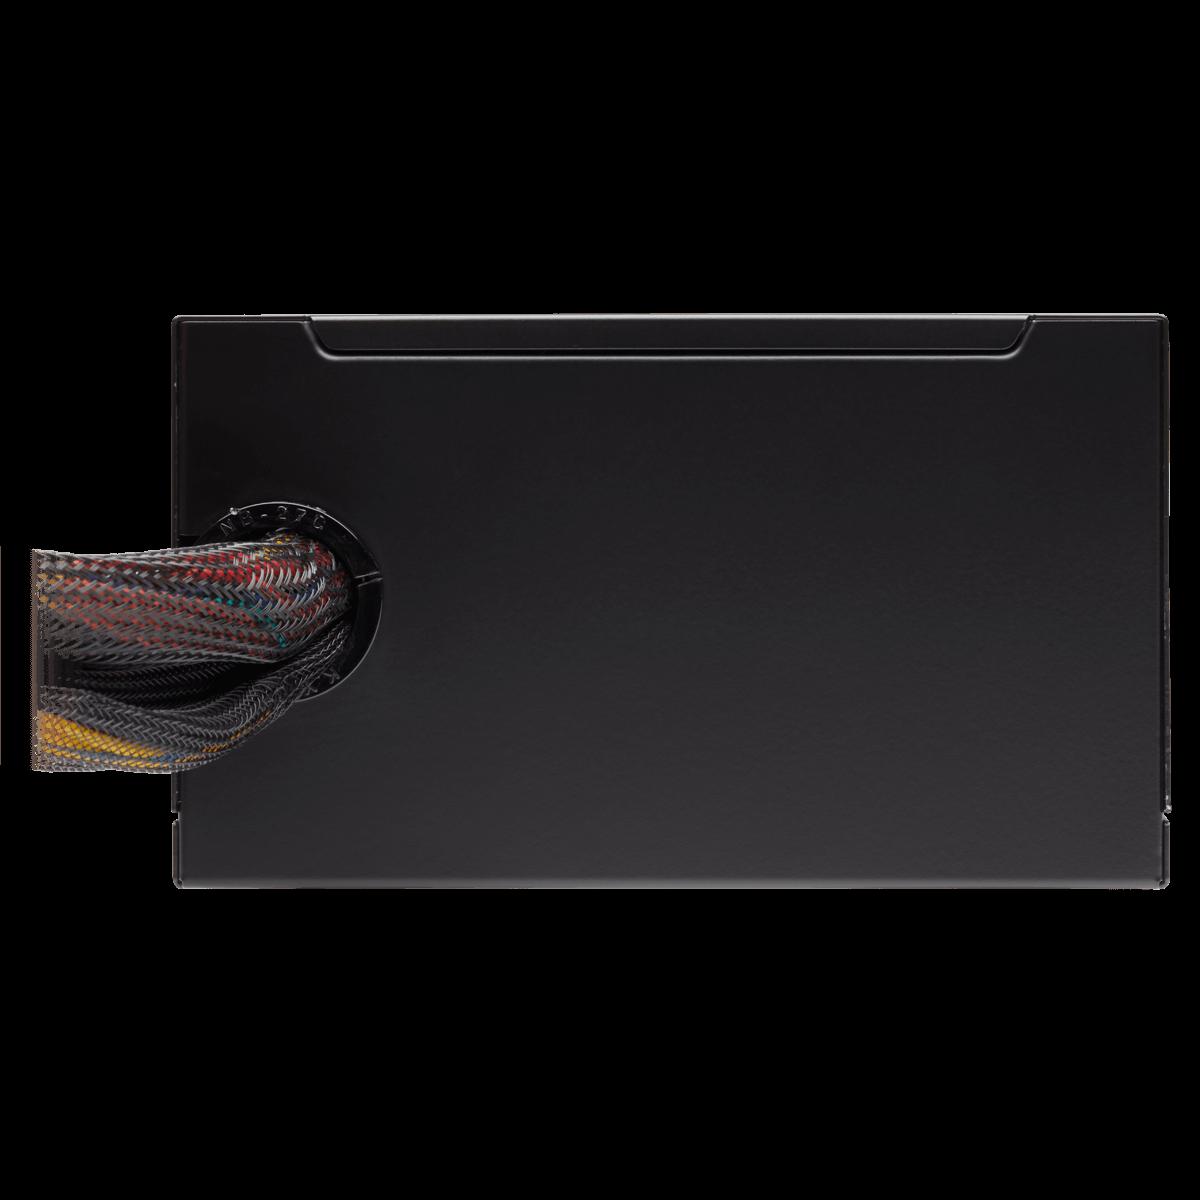 Fonte Corsair 650W VS650 80 Plus White PFC Ativo CP-9020172